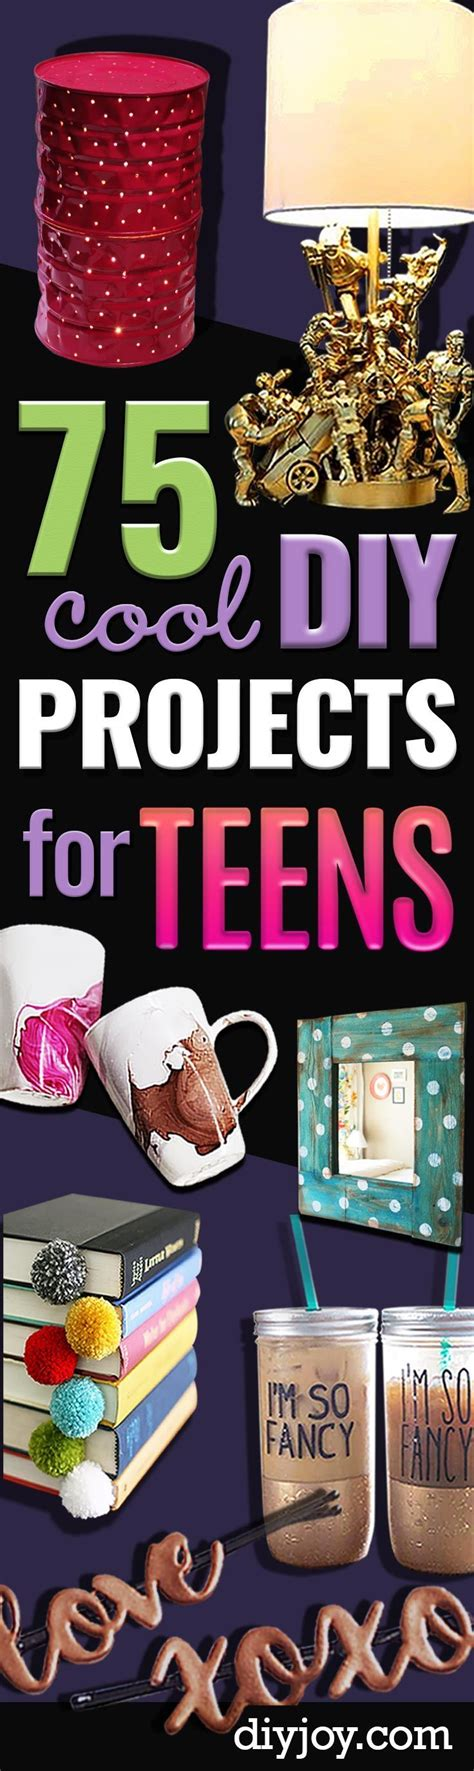 diy projects cool best 25 cool diy ideas on diy crafts diy